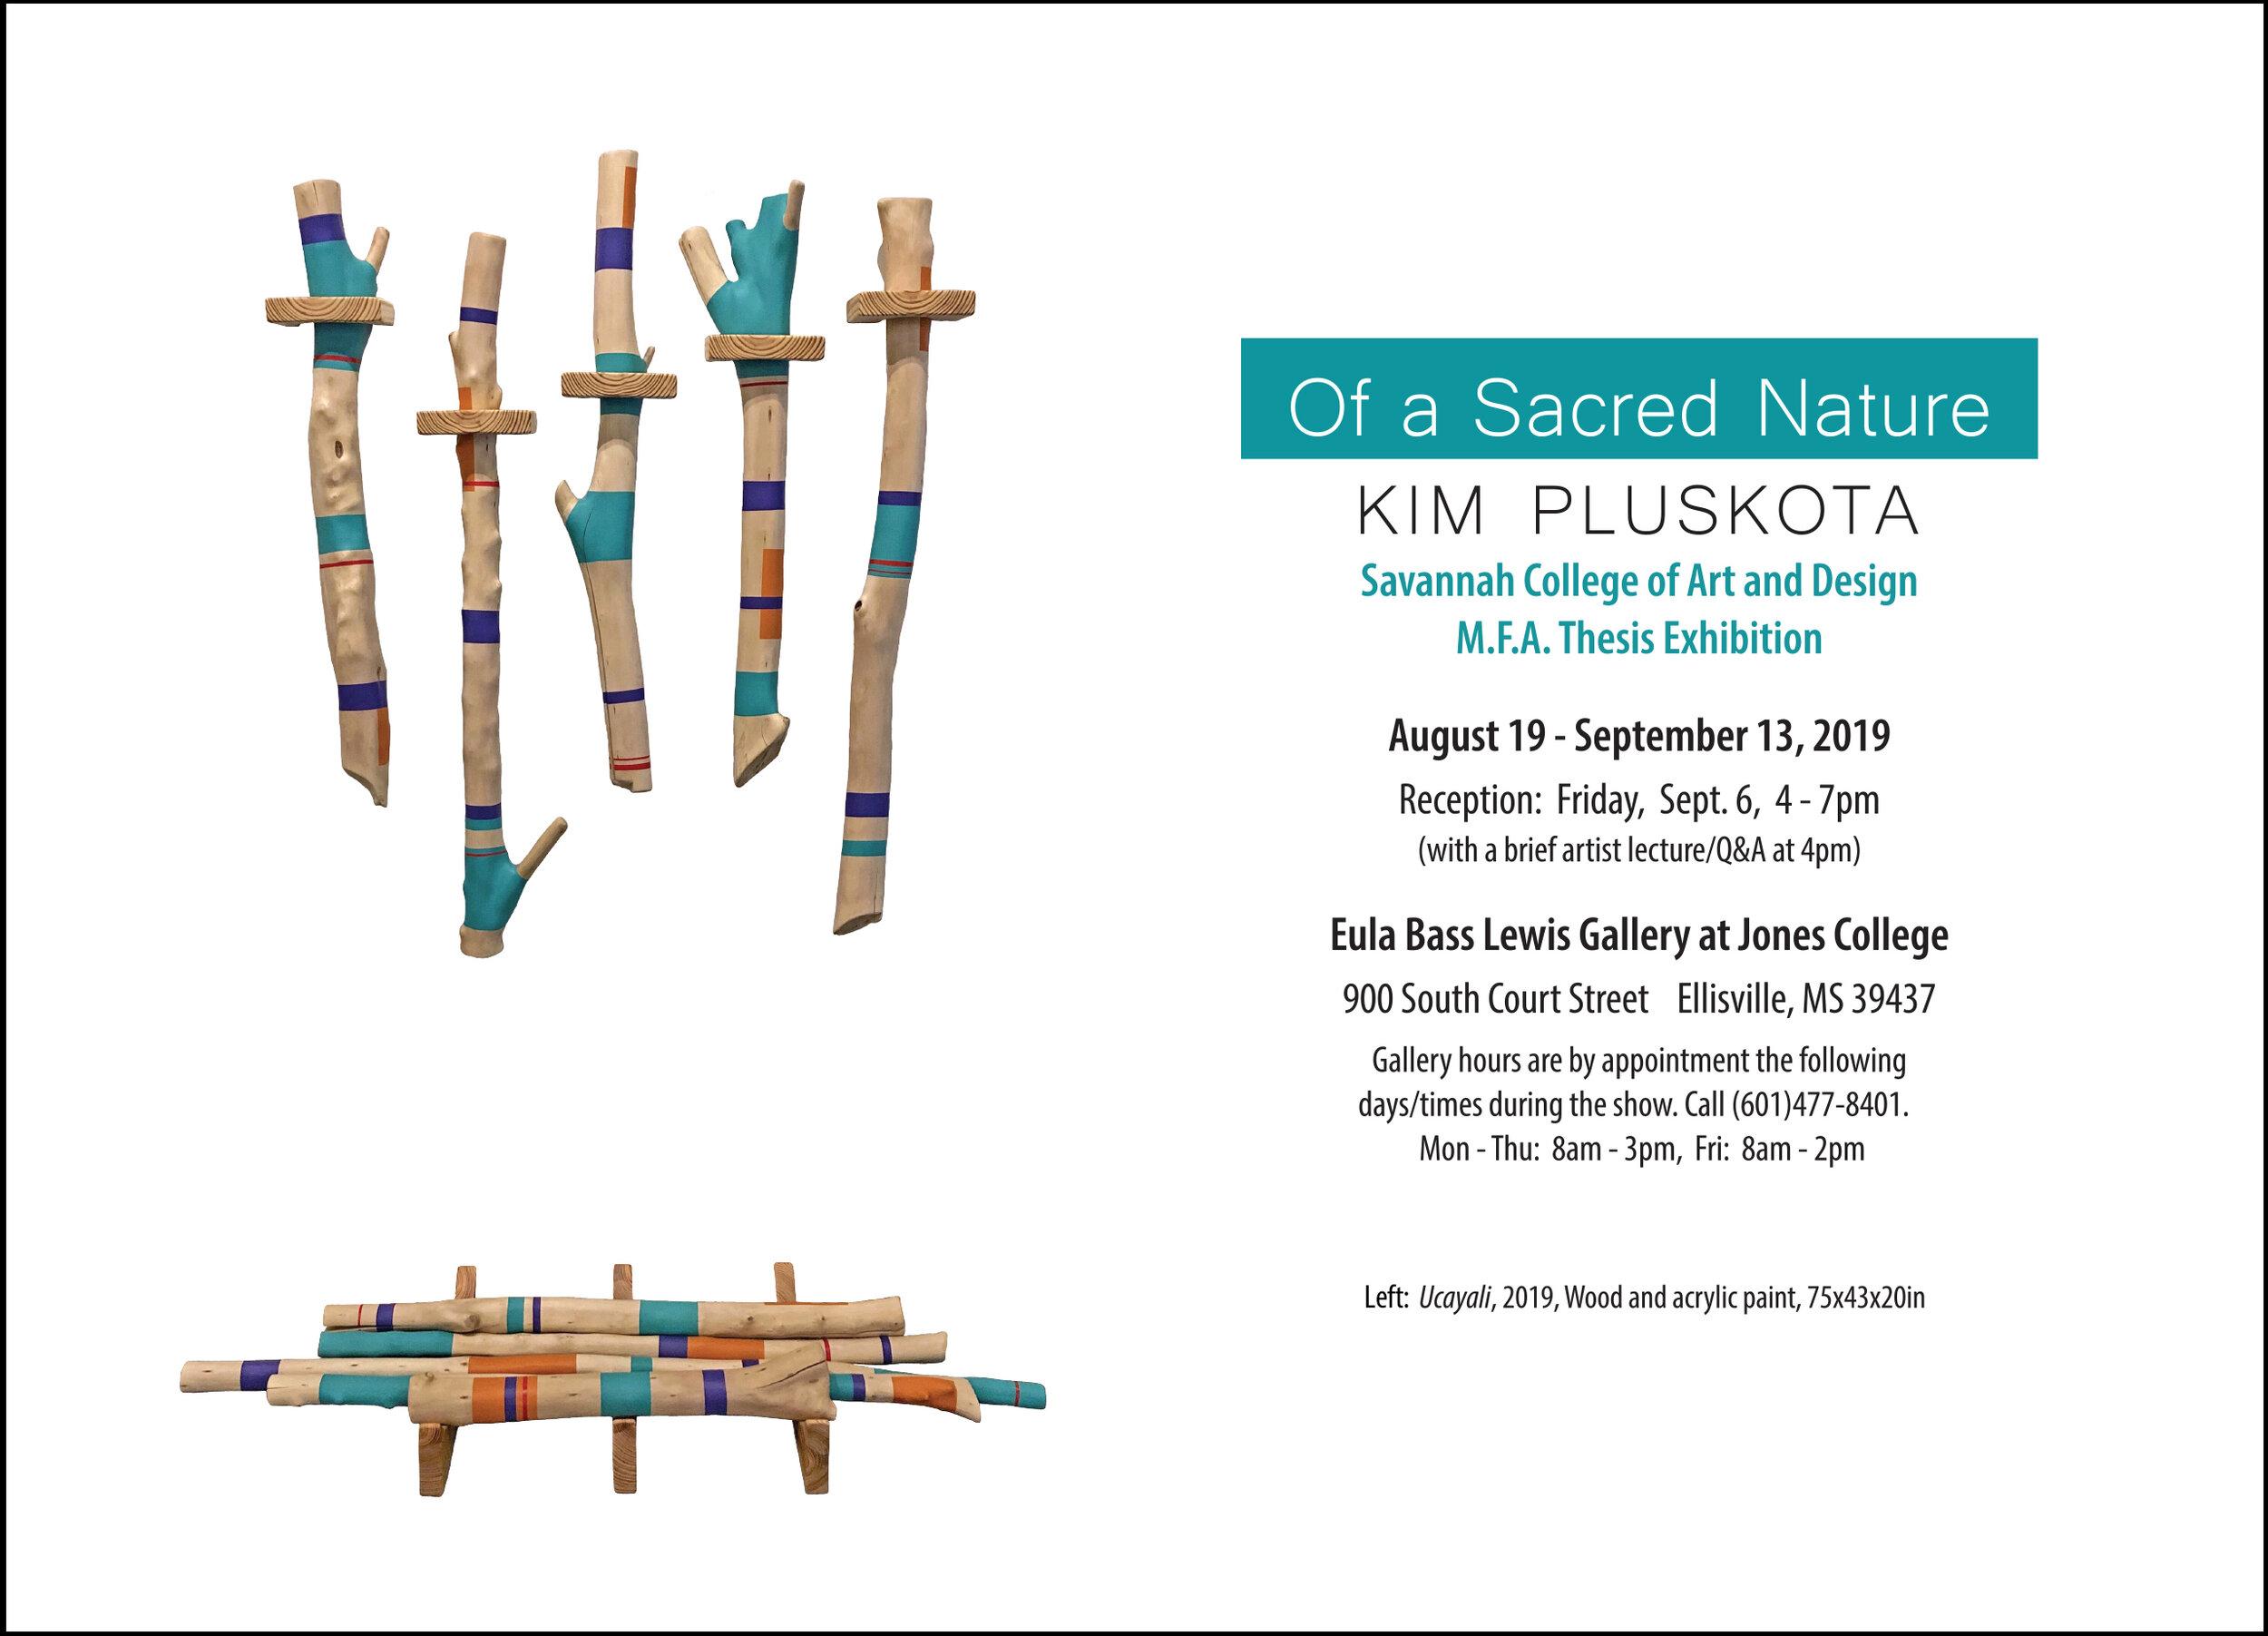 Kim_Pluskota_Thesis_Exhibition_Postcard_WEBSITEborder.jpg